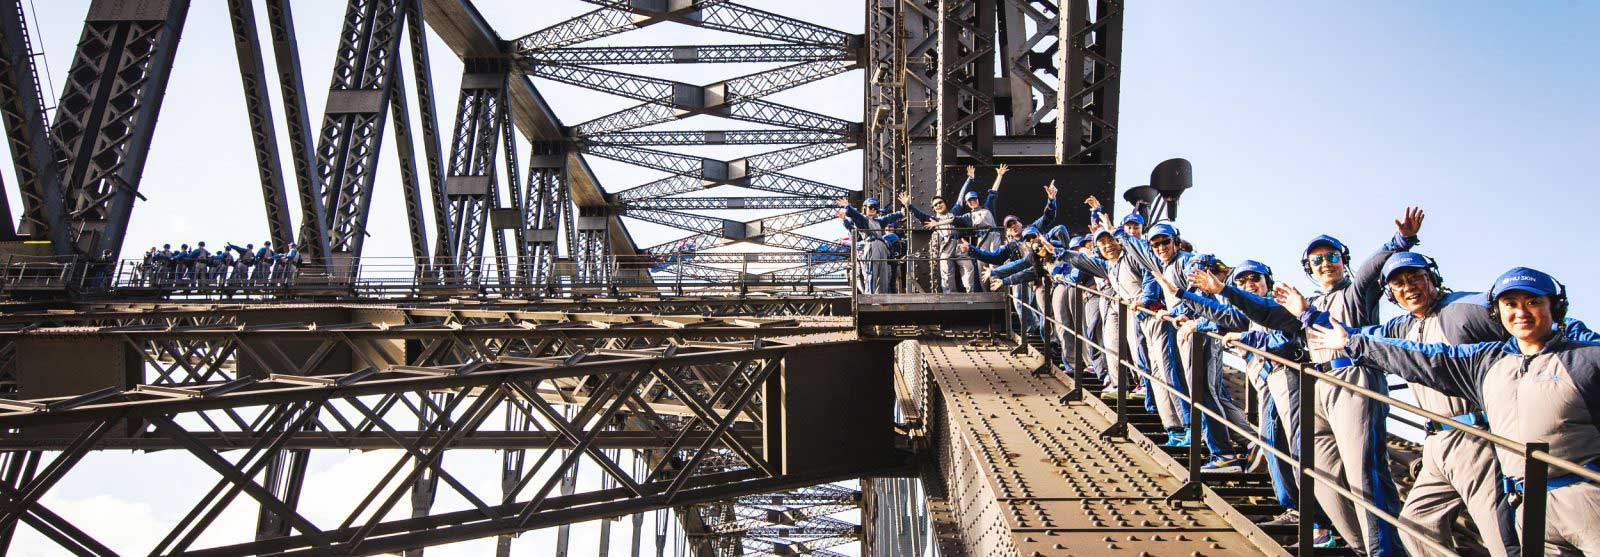 Sydney Harbour Bridge Seamlessly